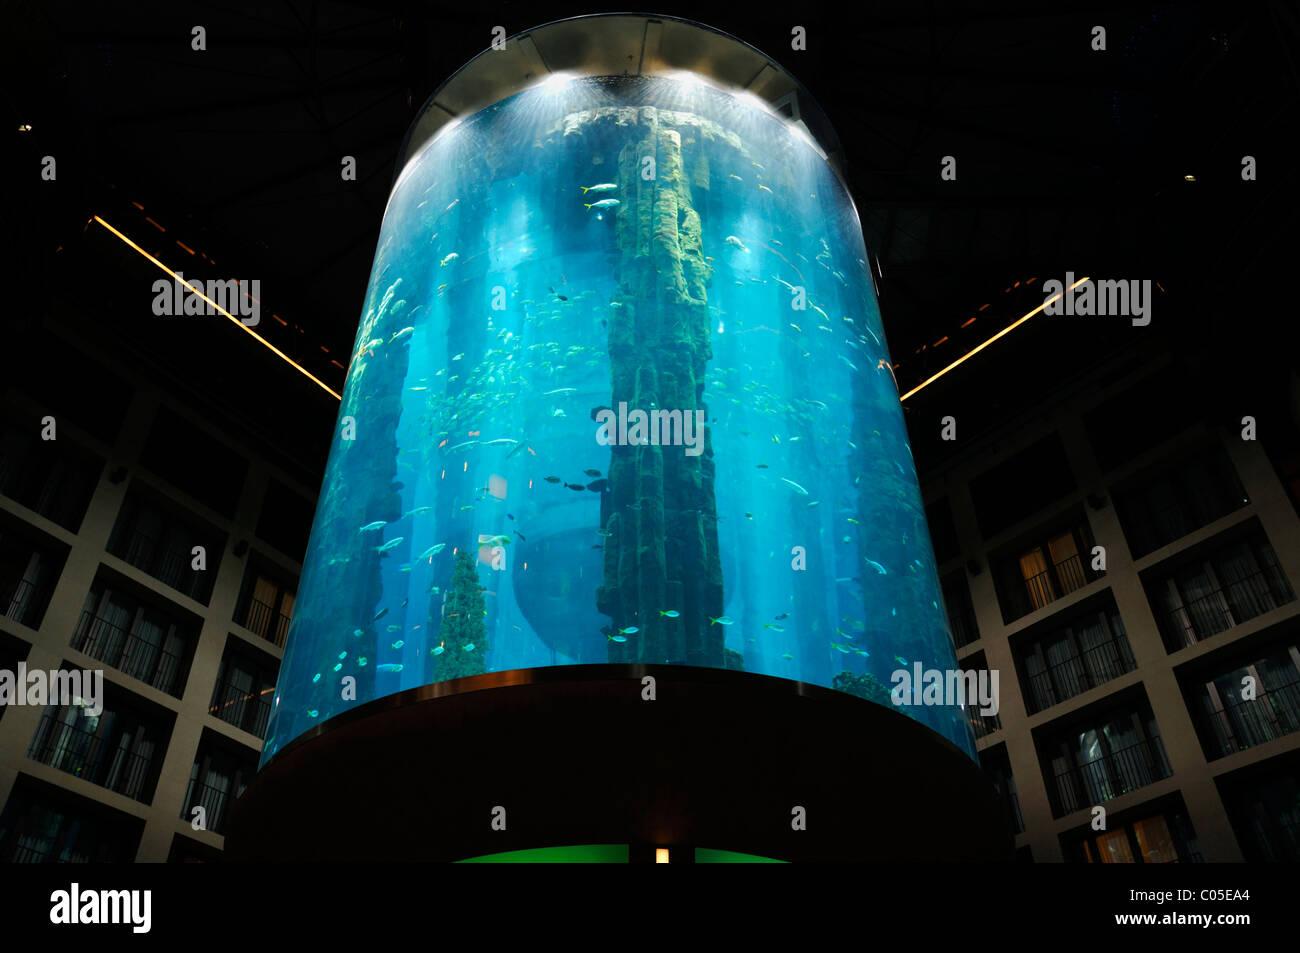 Fish aquarium at 5 stars Radisson SAS Hotel Berlin, the world's largest cylindrical aquarium, Berlin Germany - Stock Image